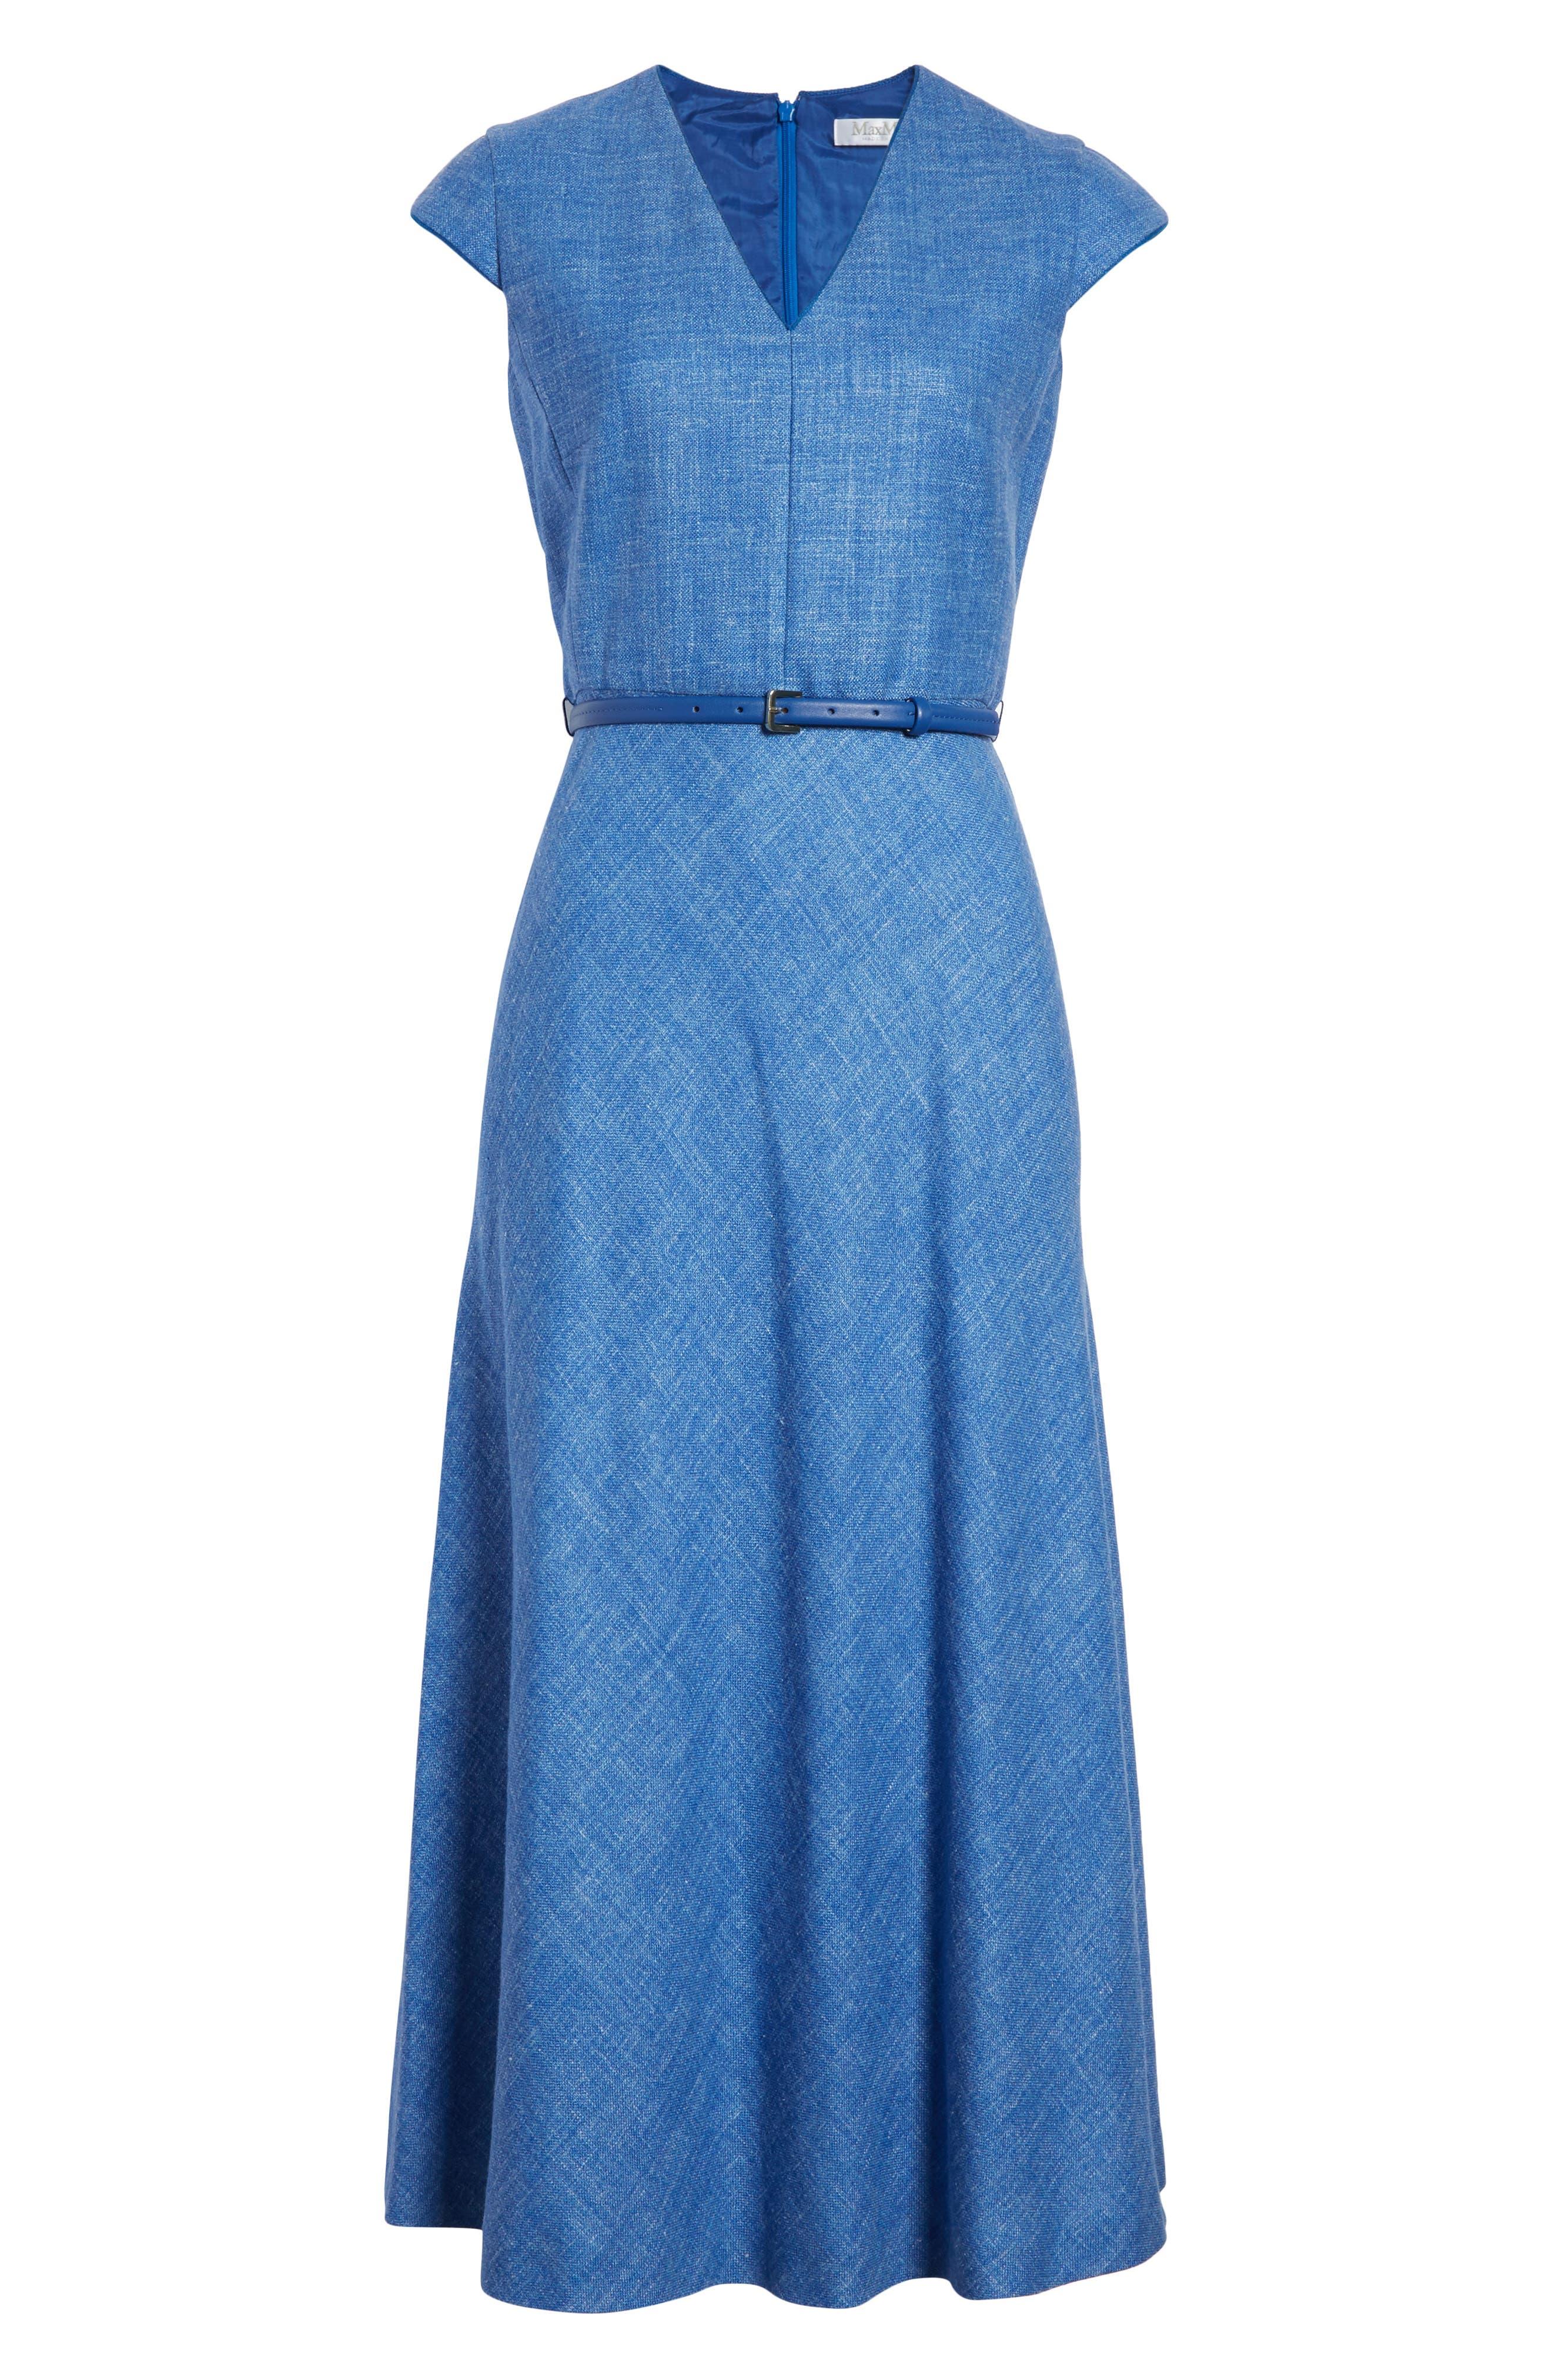 Caramba Silk, Linen & Wool Midi Dress,                             Alternate thumbnail 6, color,                             Cornflower Blue